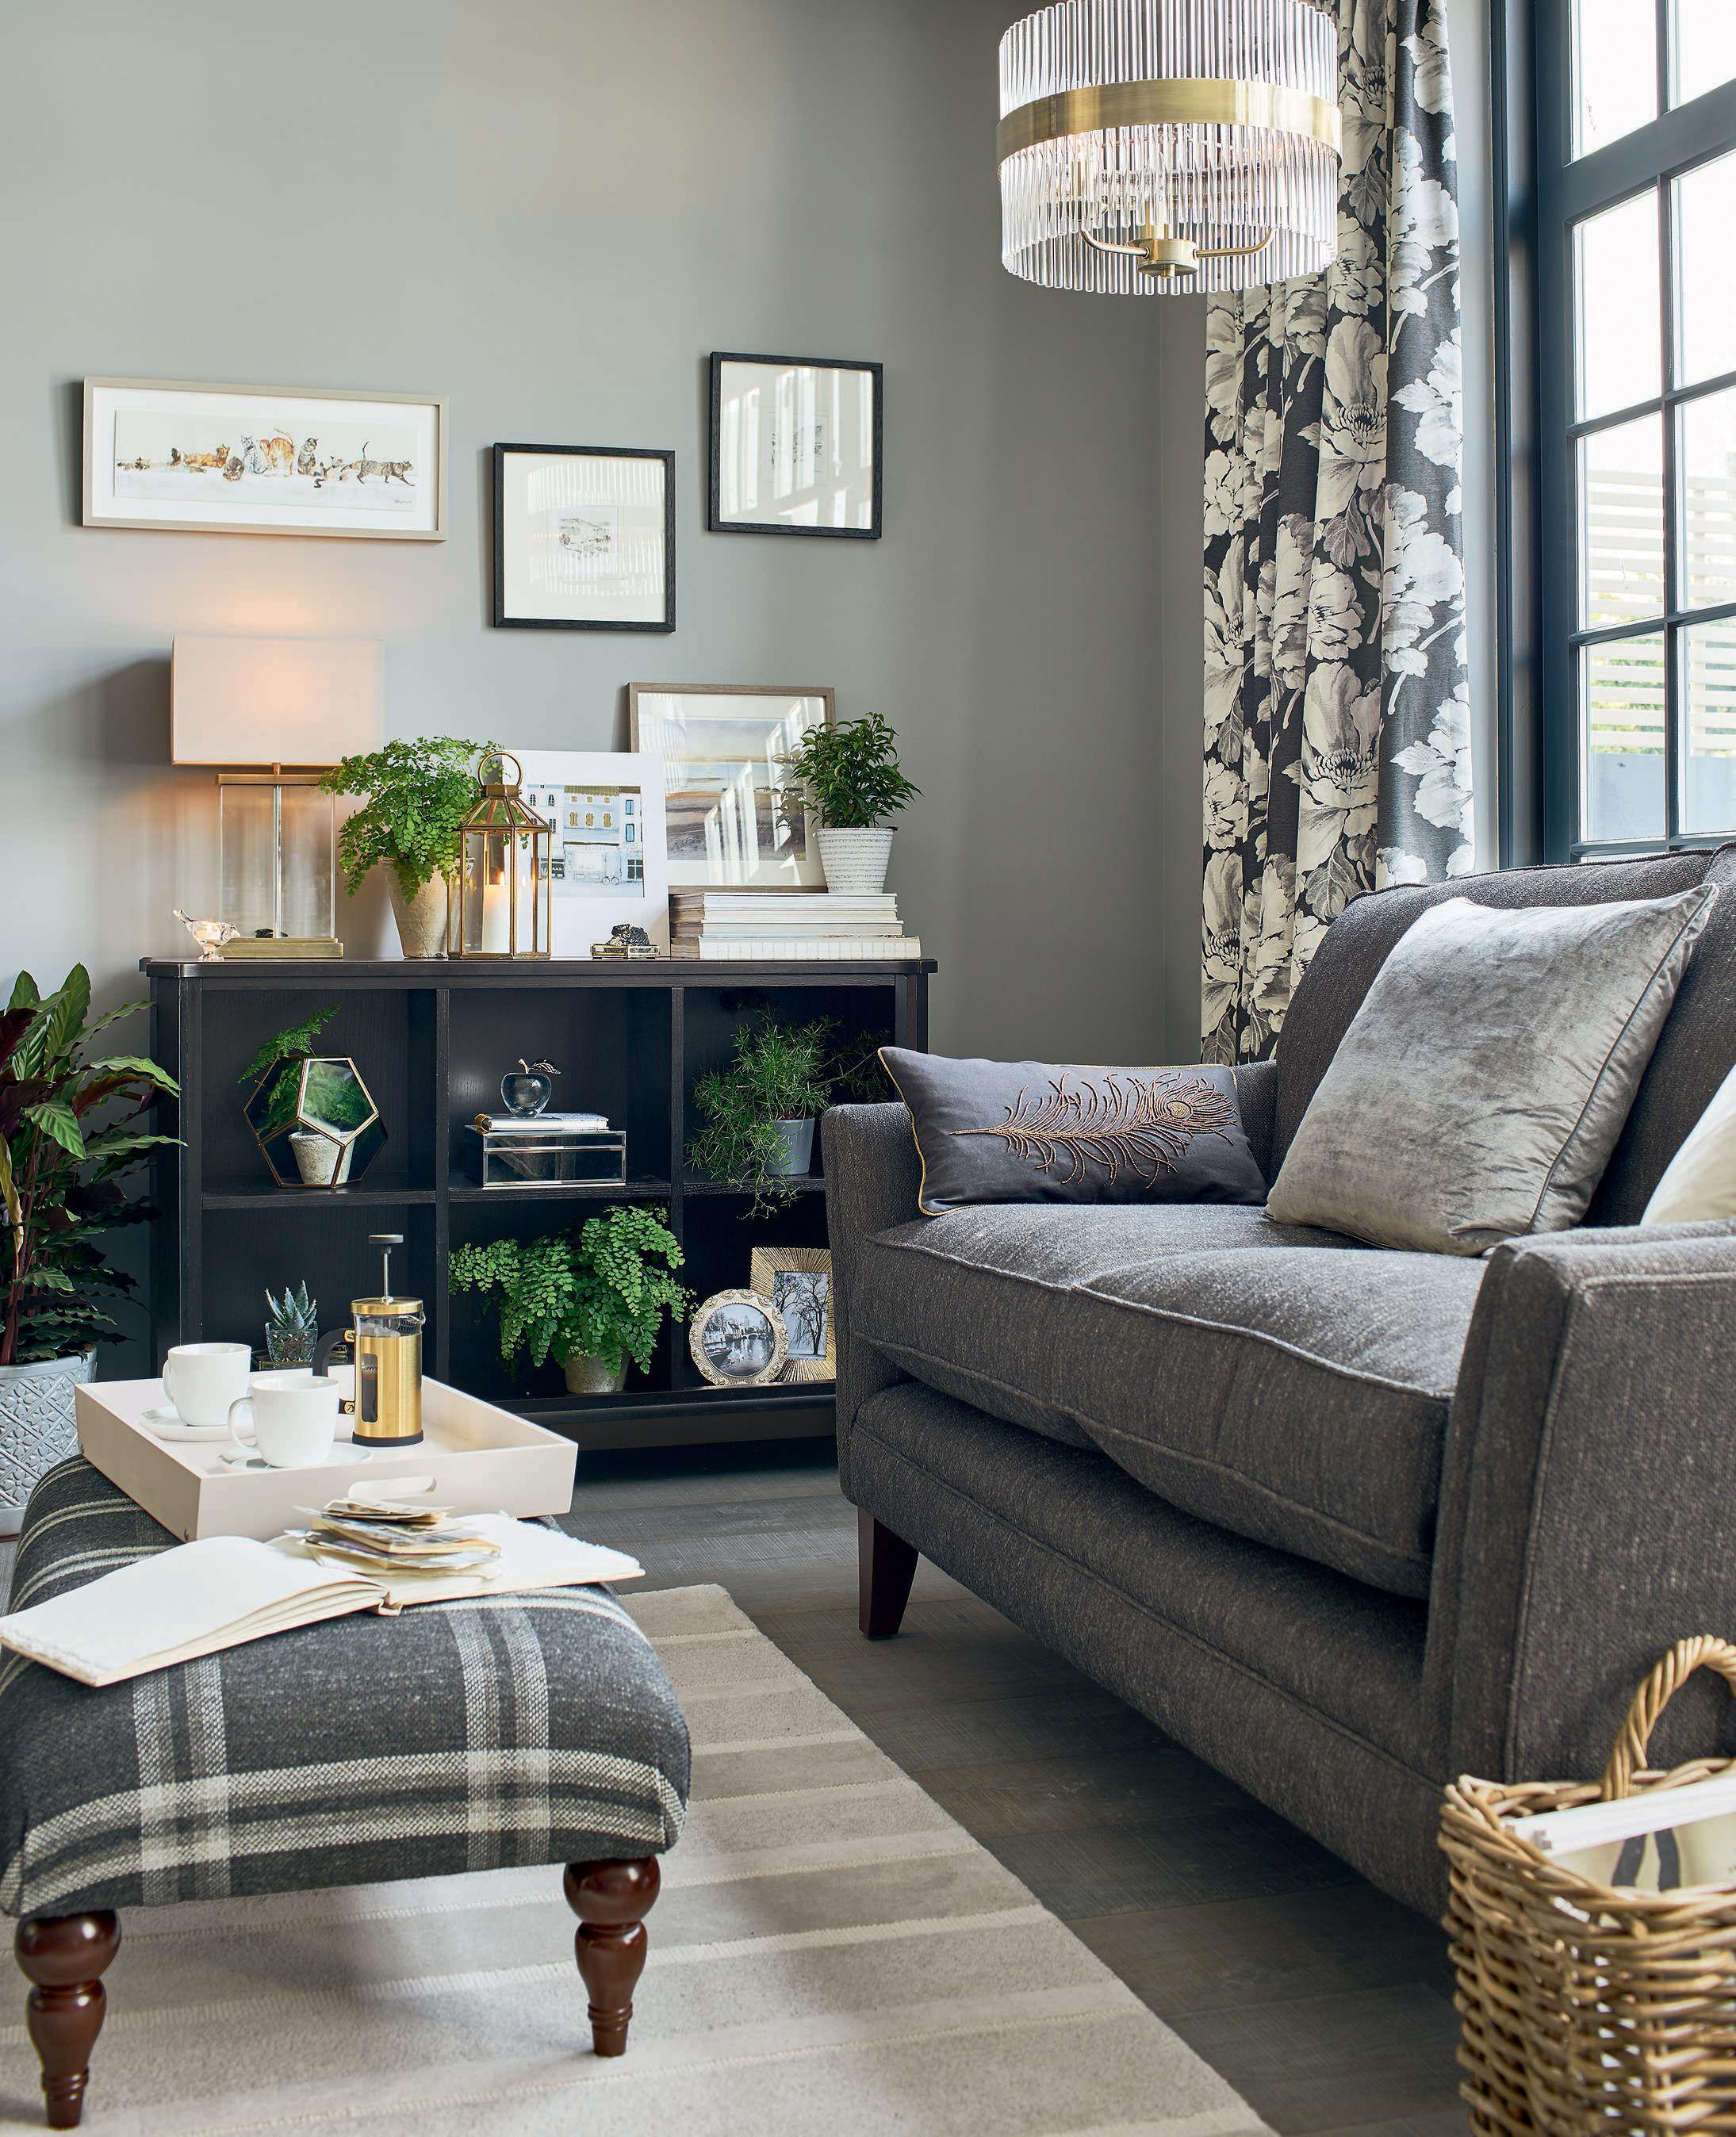 designs room on living design ideas beach decorating wonderful livings livingroom cottage interior home style